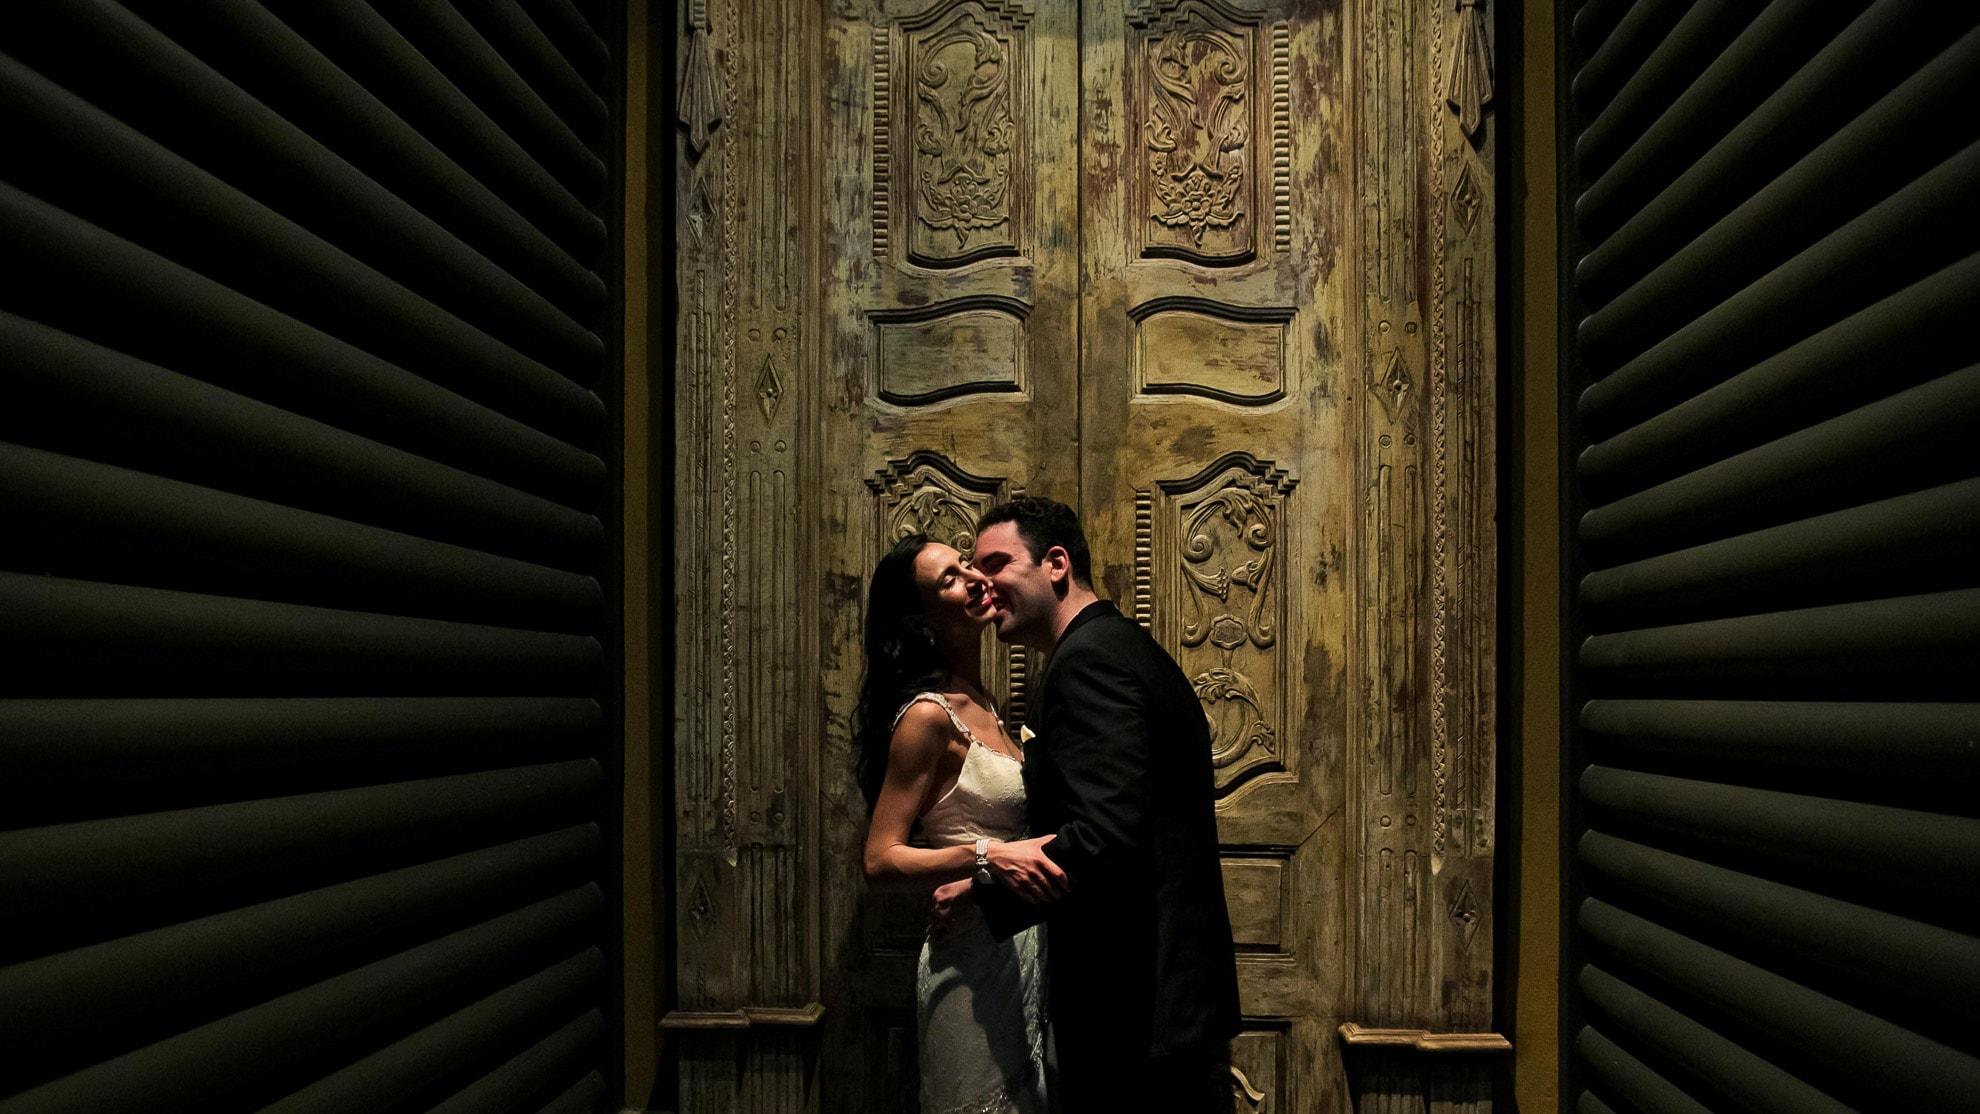 Best wedding photos 2014